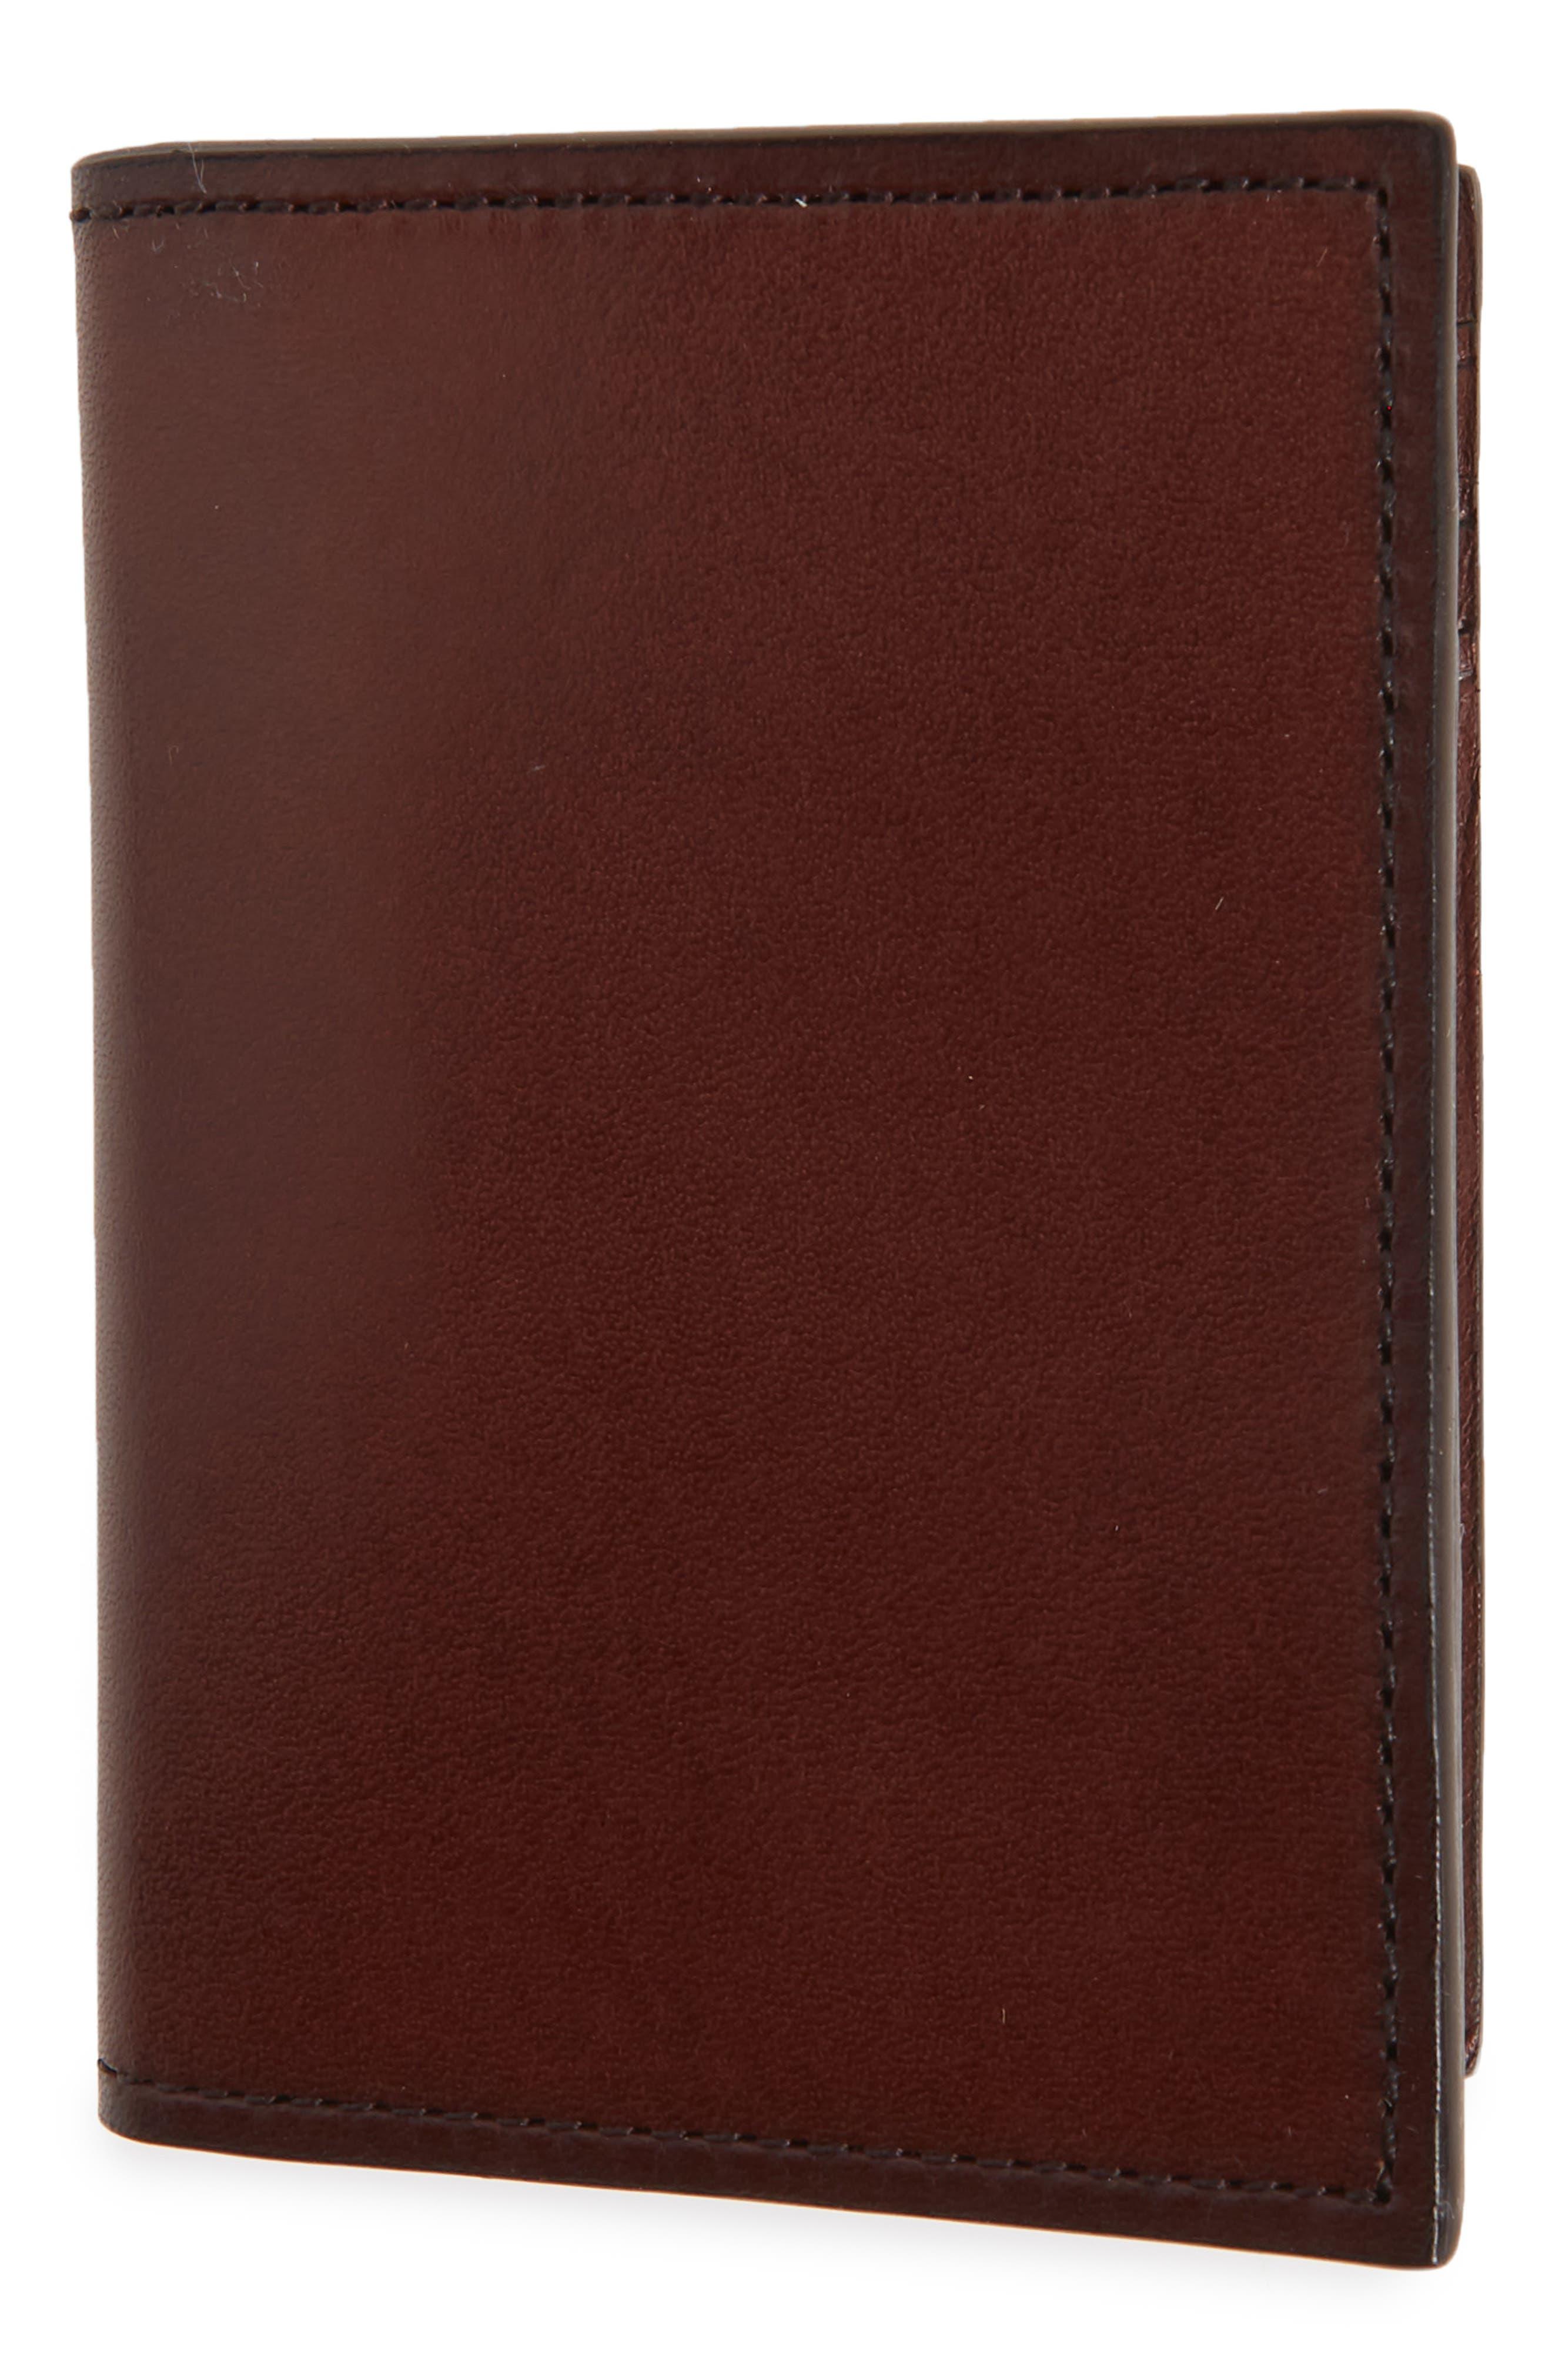 Parker Leather Bifold Card Case,                             Main thumbnail 1, color,                             210